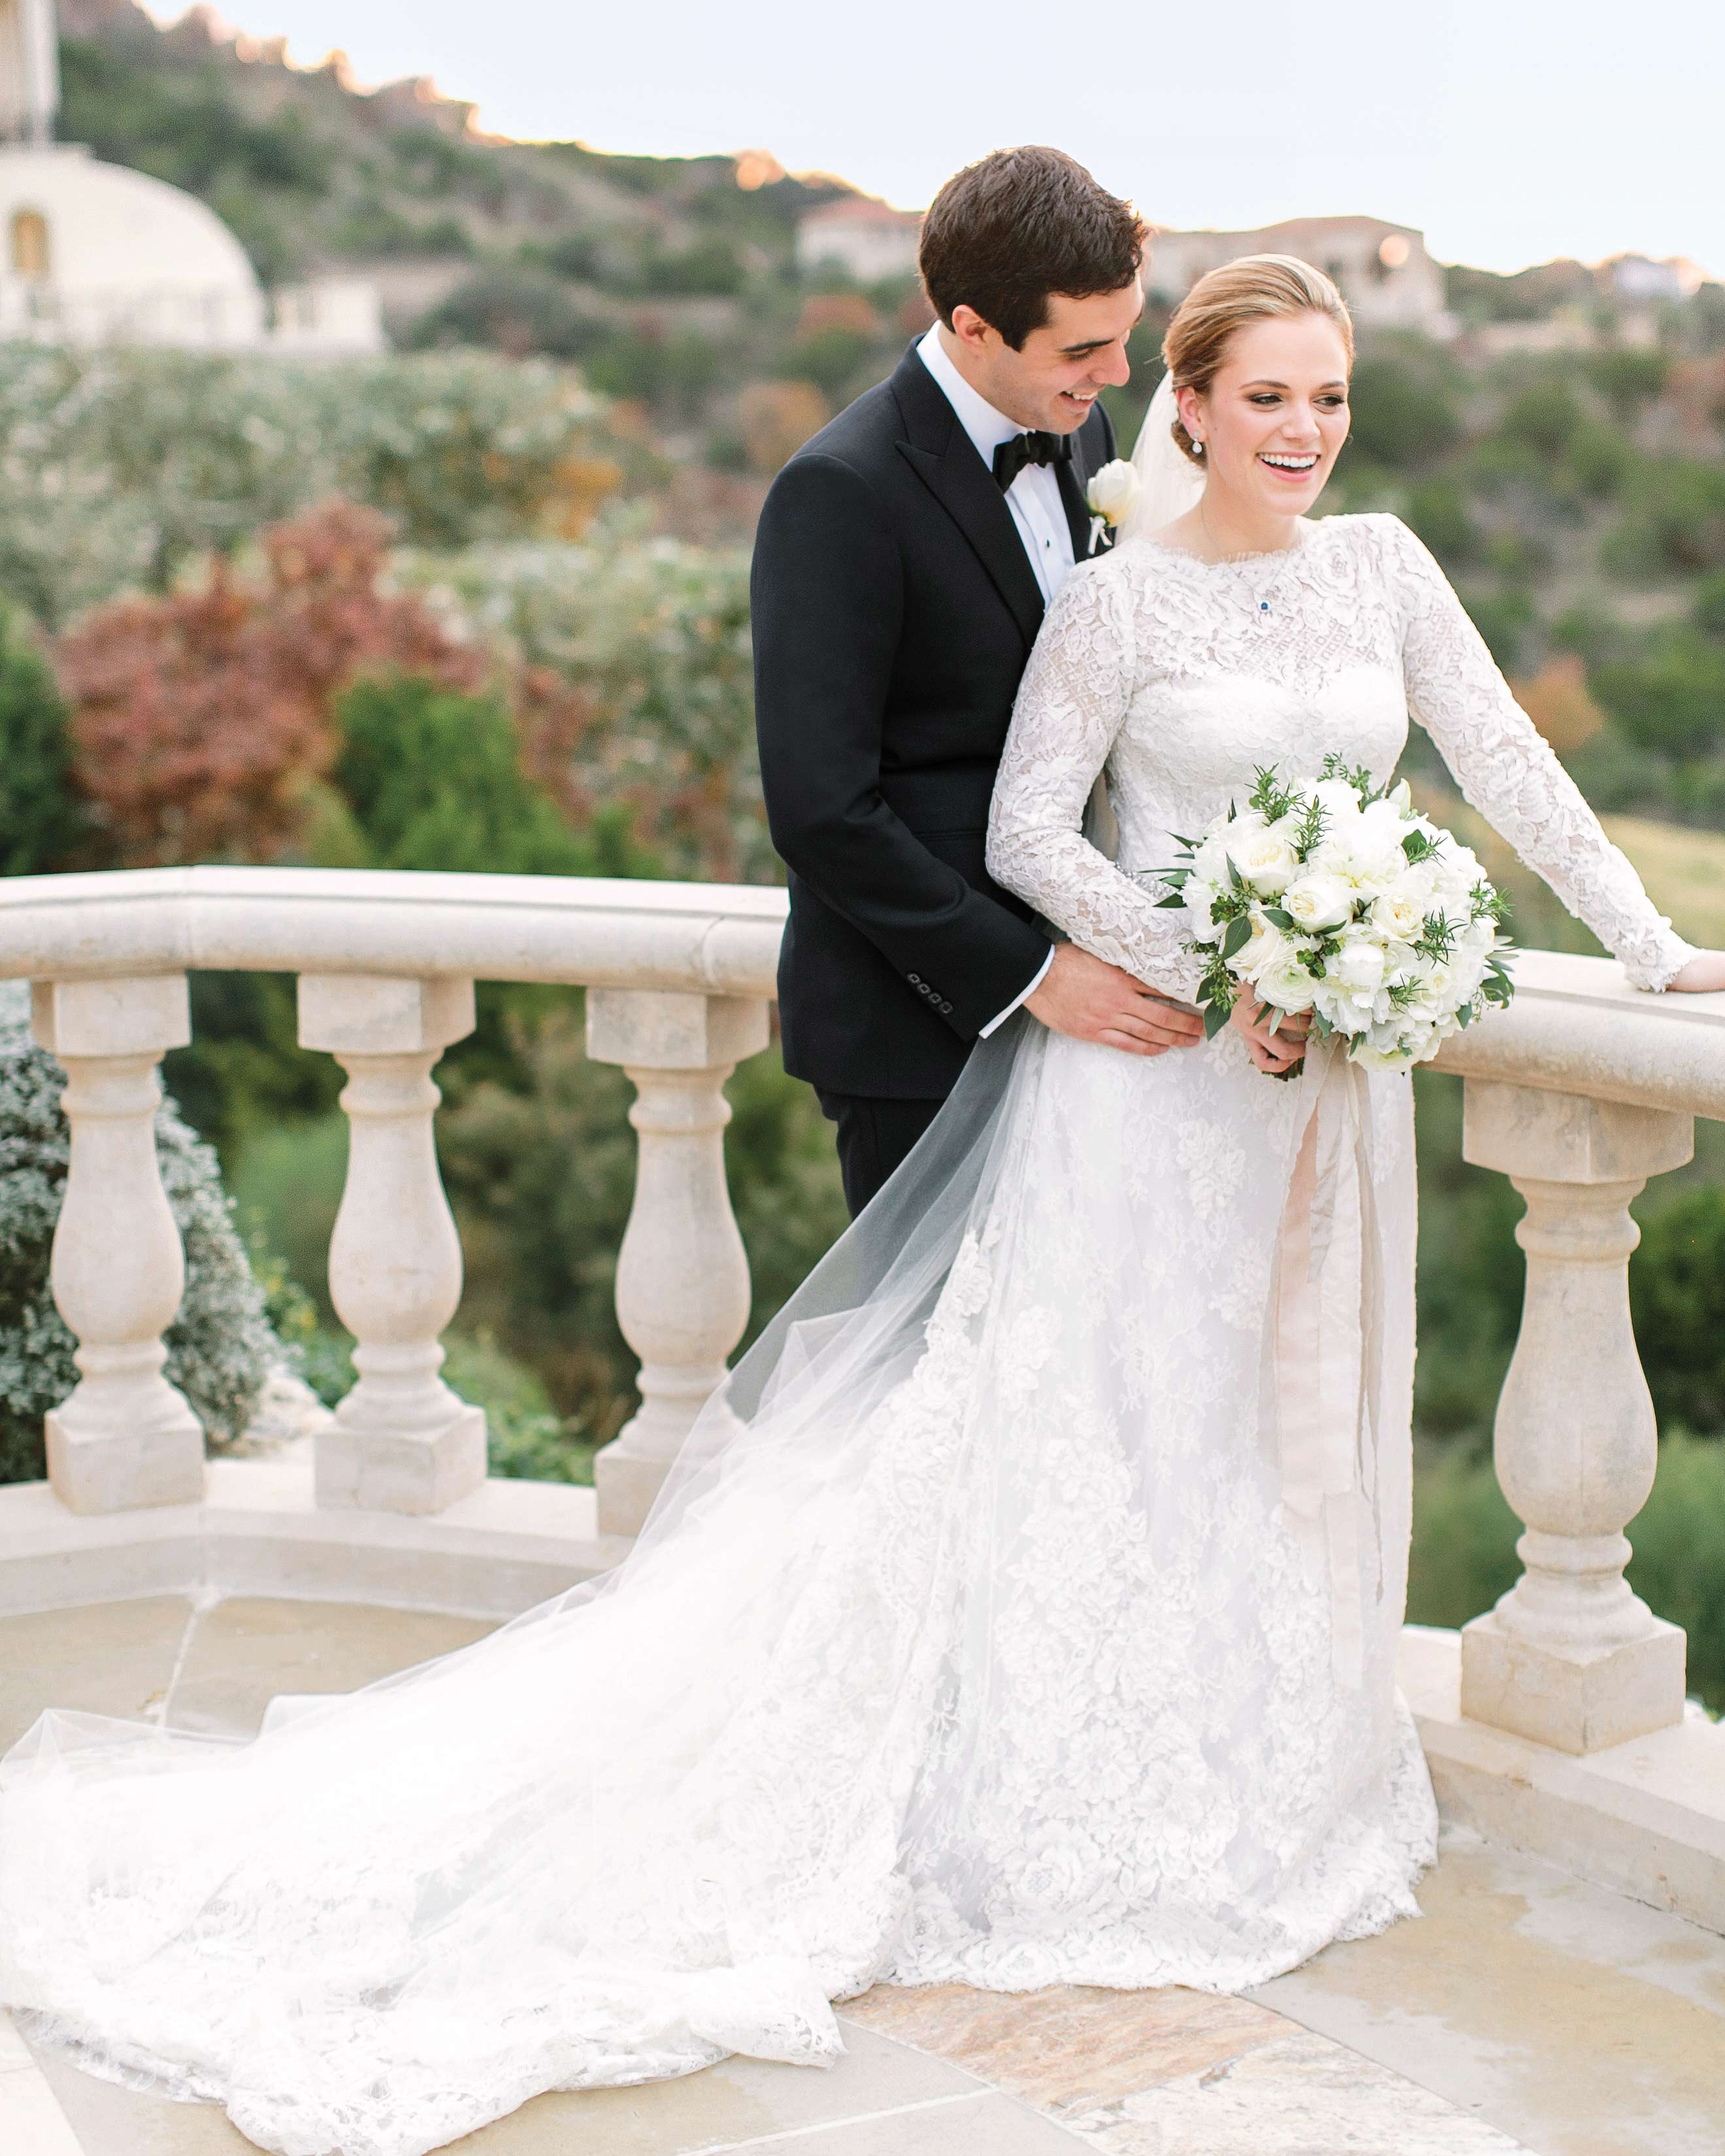 mmallory-diego-wedding-texas-bride-and-groom-138-s112628.jpg